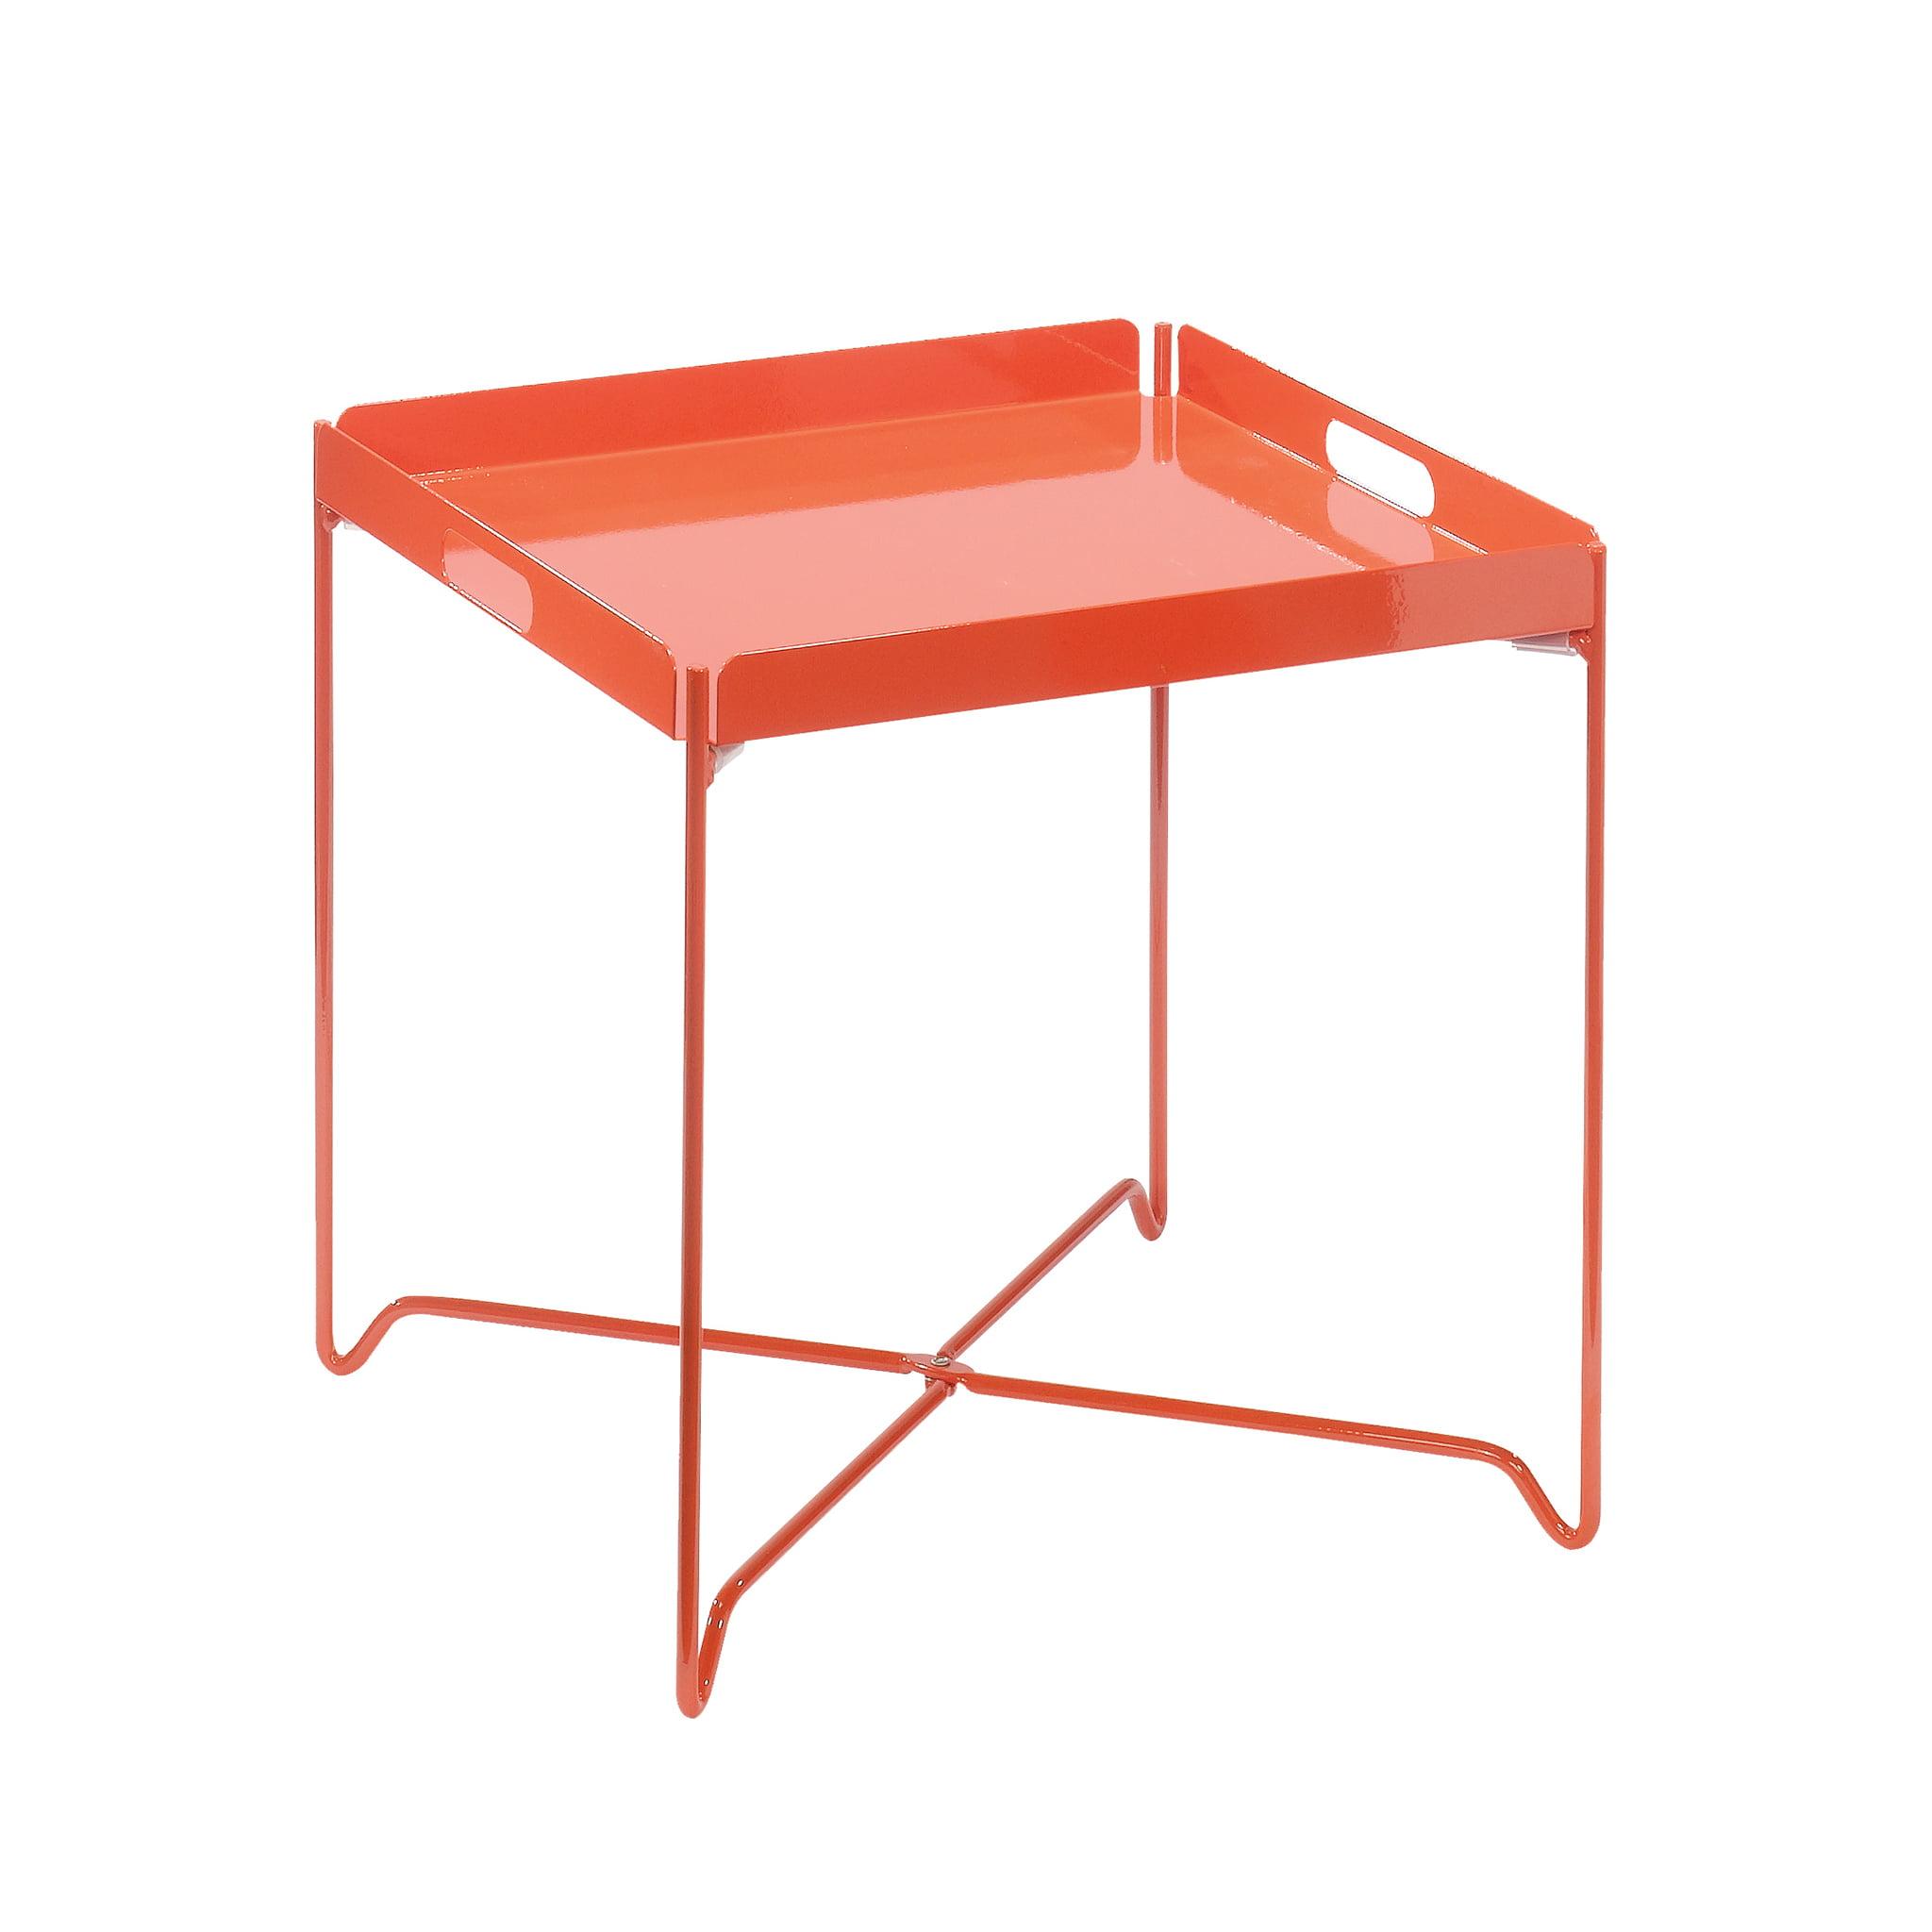 Sauder Harvey Park Tray Accent Table, Orange Blush